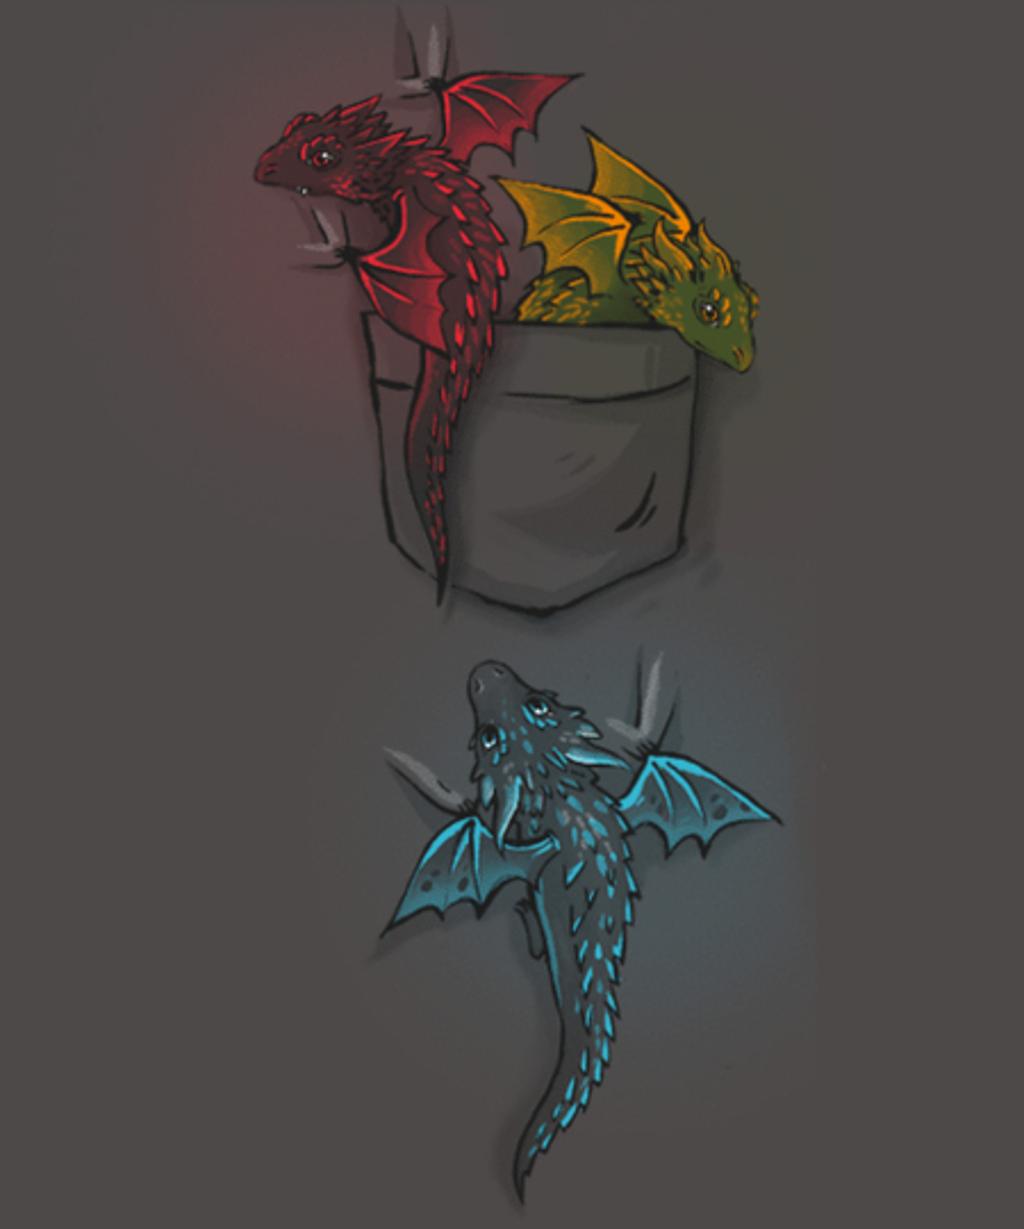 Qwertee: Pocket of Dragons